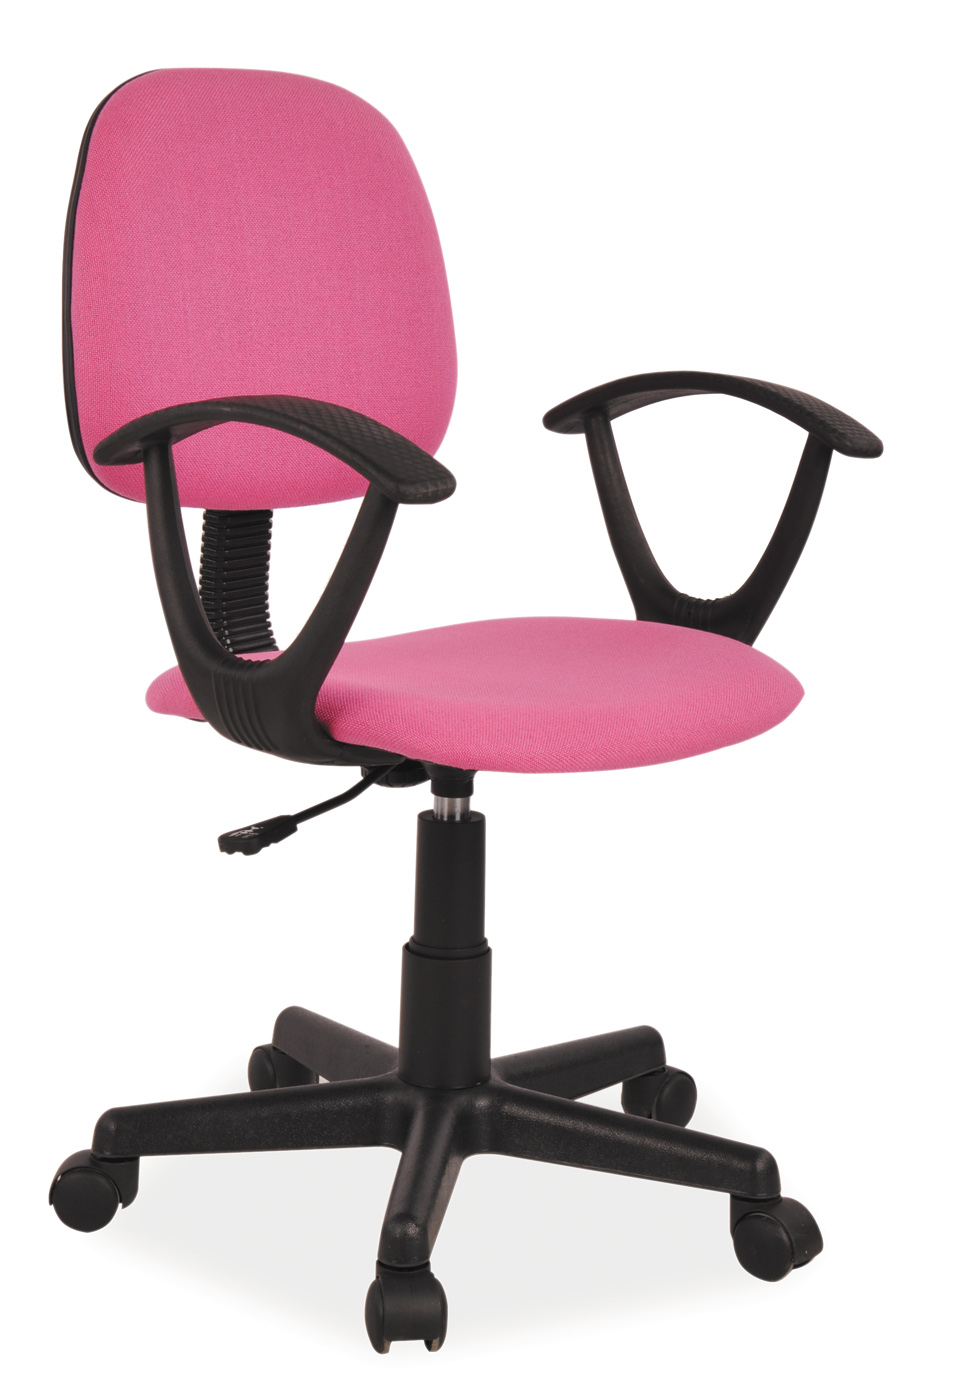 Scaun de birou pentru copii Q-149 roz